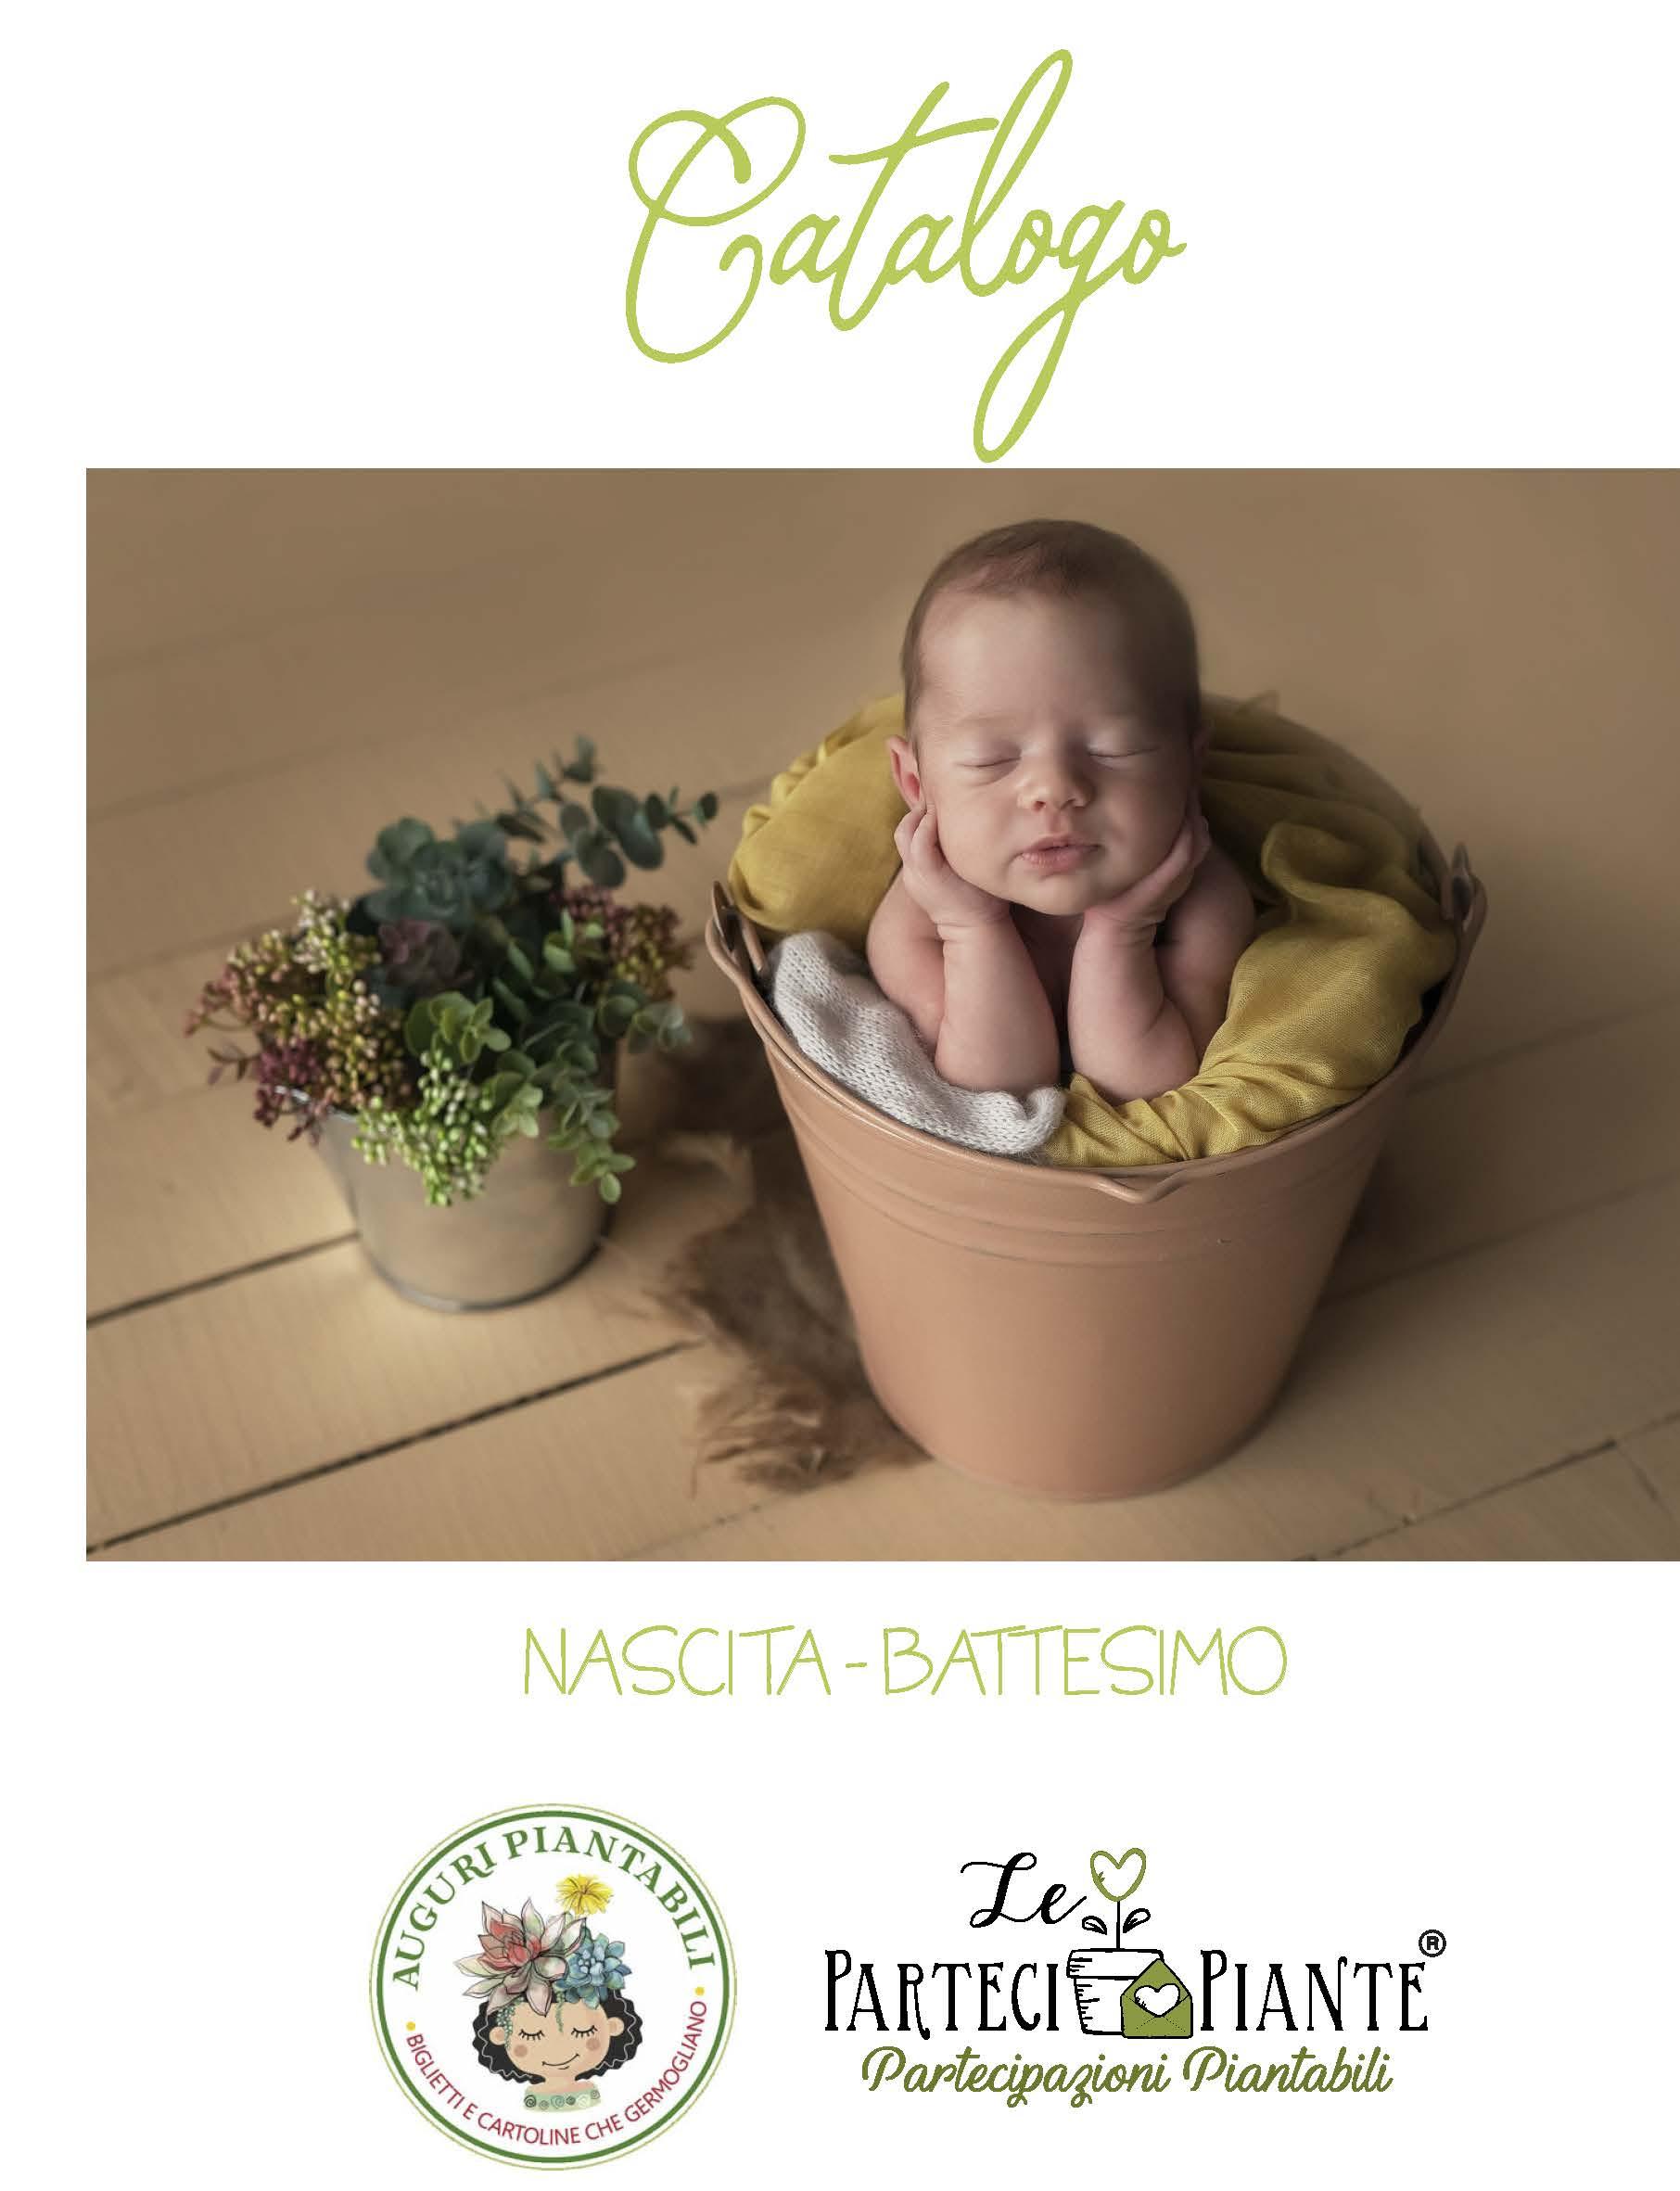 catalogo nascita e battesimo 2021 partec